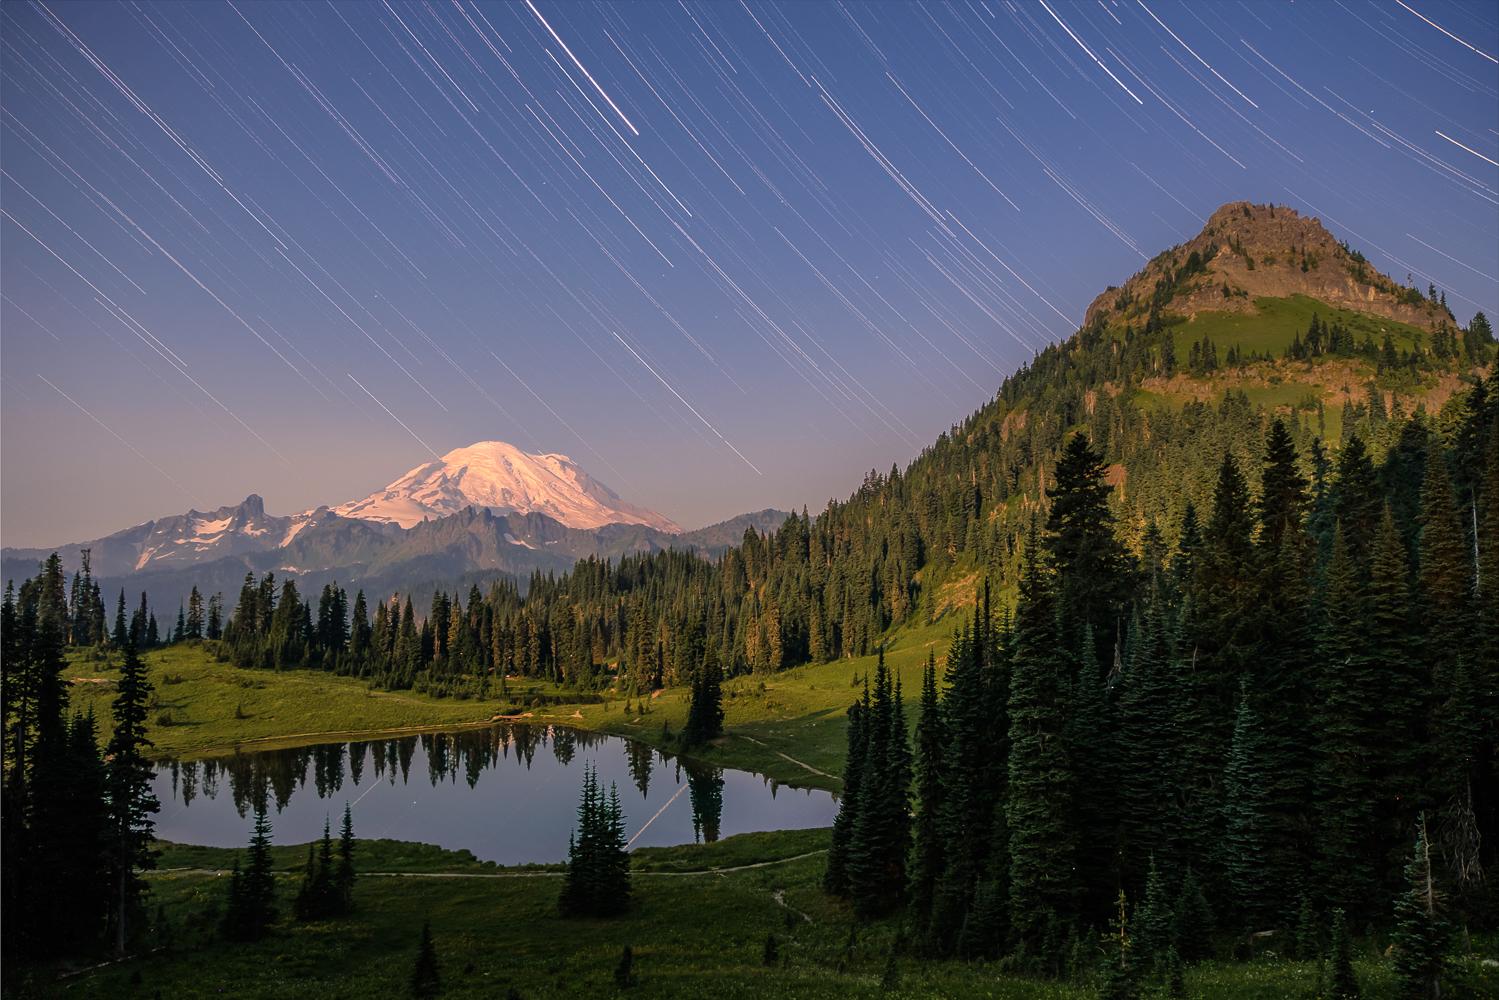 A full-moon timelapse of the night sky above Tipsoo Lake, Mount Rainier, and Yakima Peak.